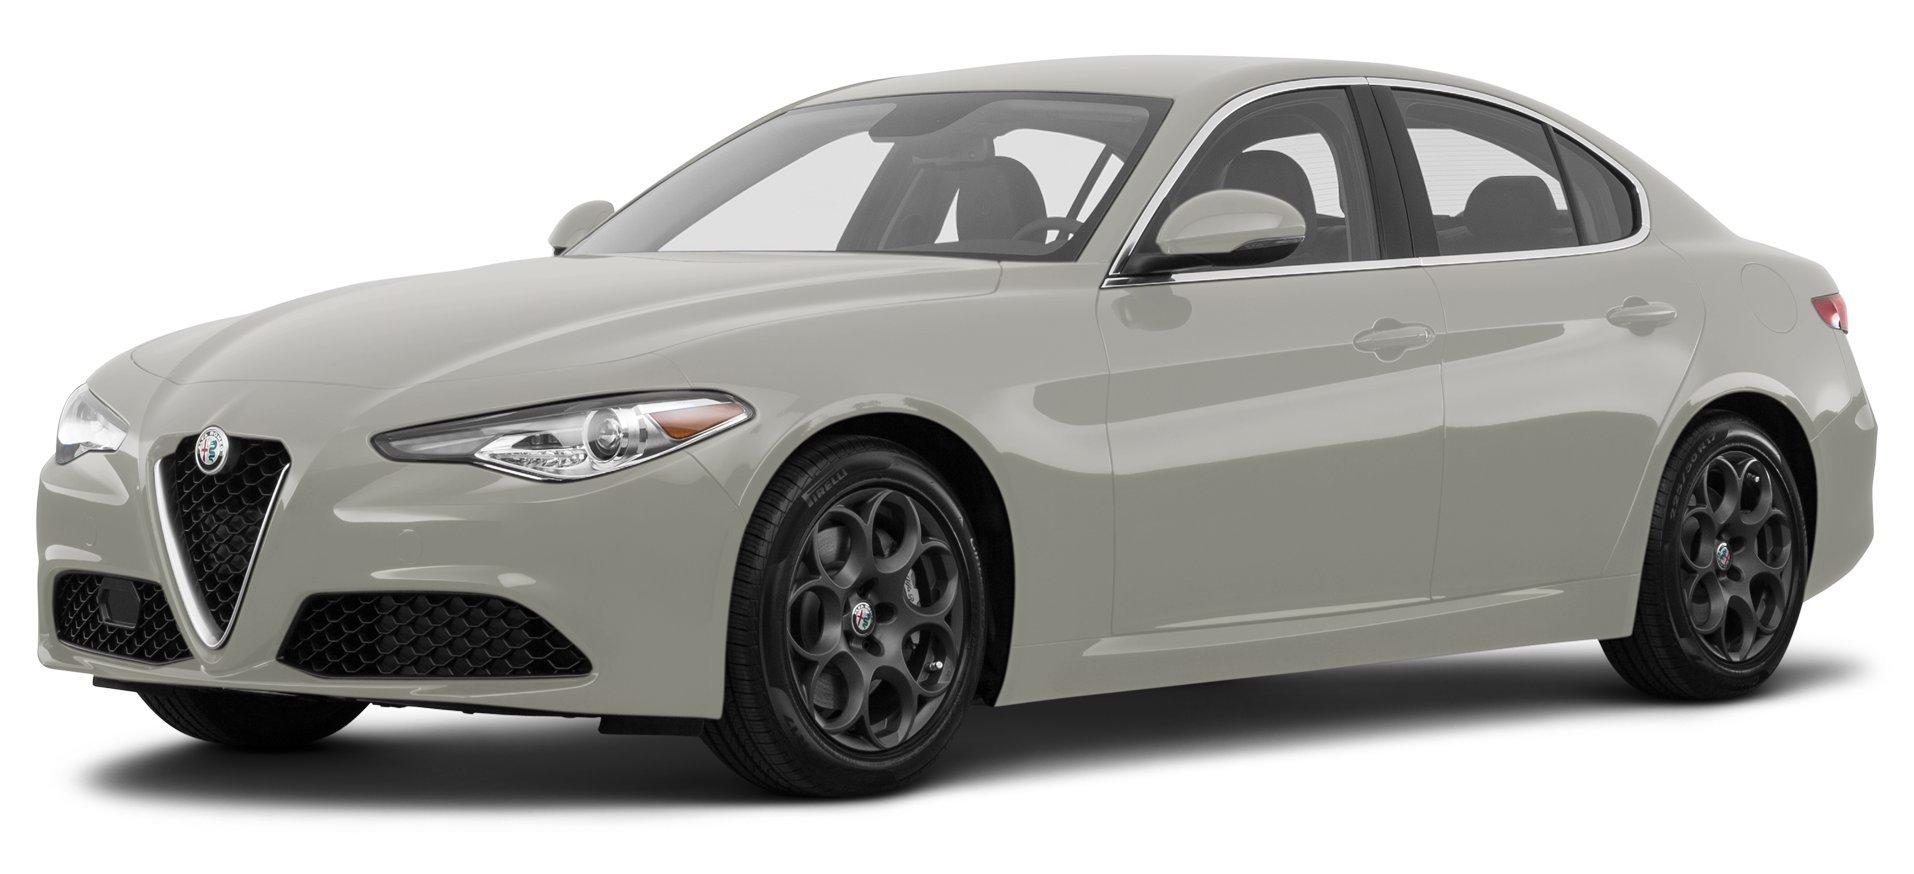 2017 Audi A4 Quattro Reviews Images And Specs Vehicles Lincoln Mkz Hybrid 2011 Fuse Box Alfa Romeo Giulia All Wheel Drive